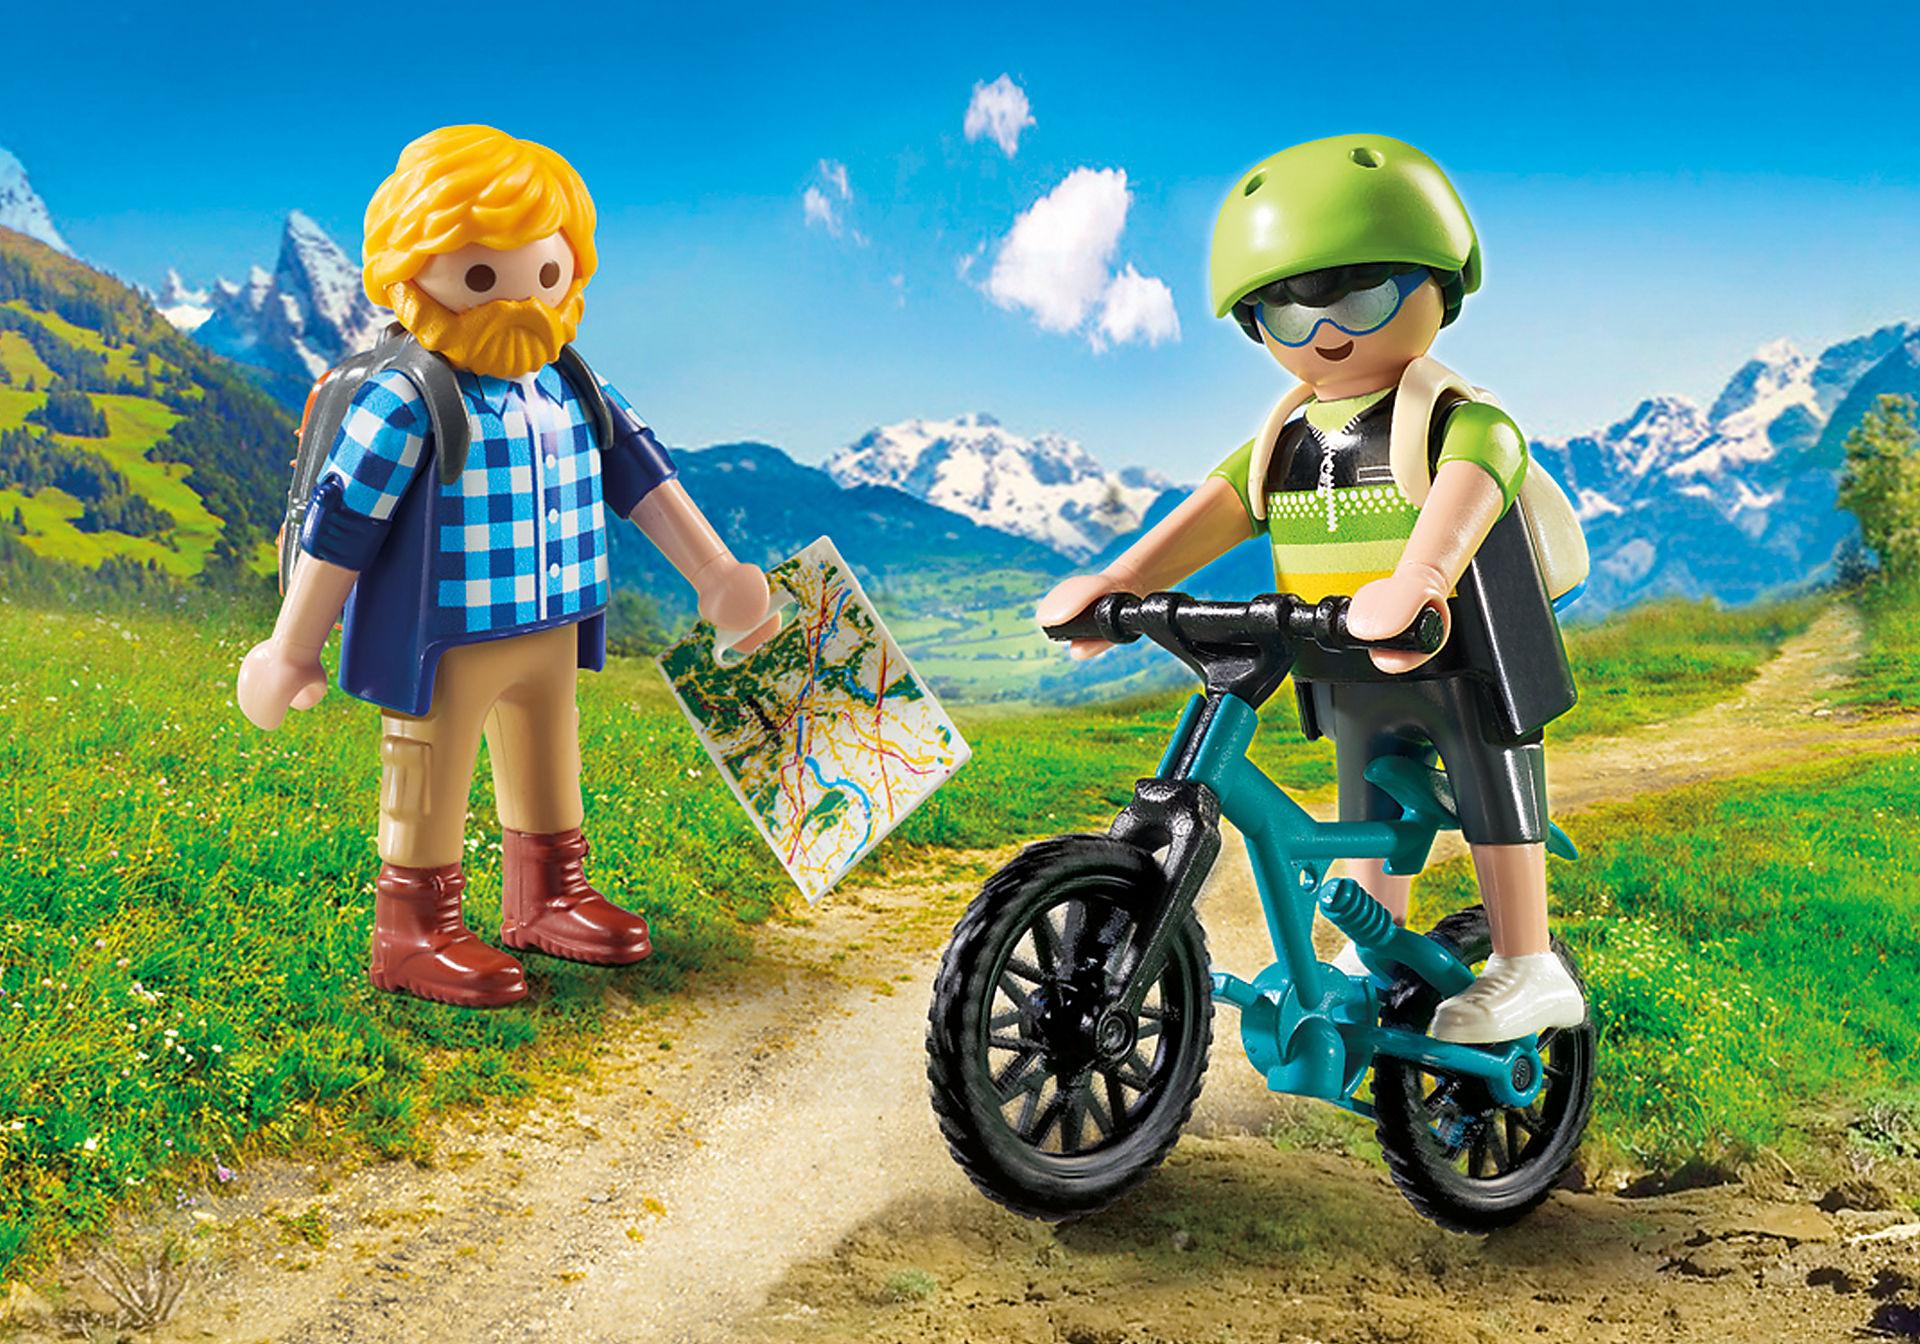 http://media.playmobil.com/i/playmobil/9129_product_detail/Turyści w górach